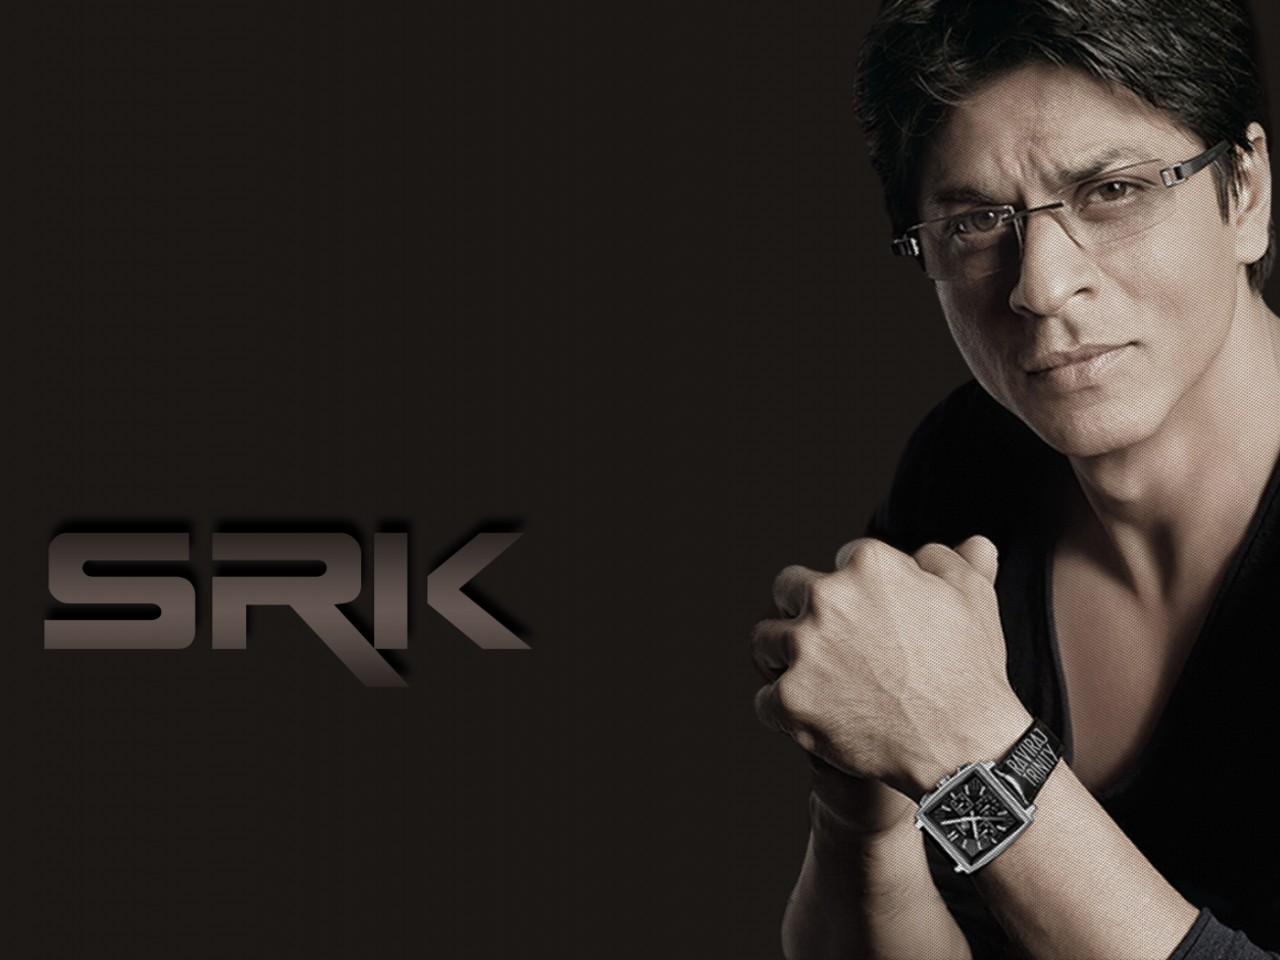 Shahrukh Khan Wallpapers Hd Download Free 1080p: Shahrukh Khan HD Wallpapers Free Download